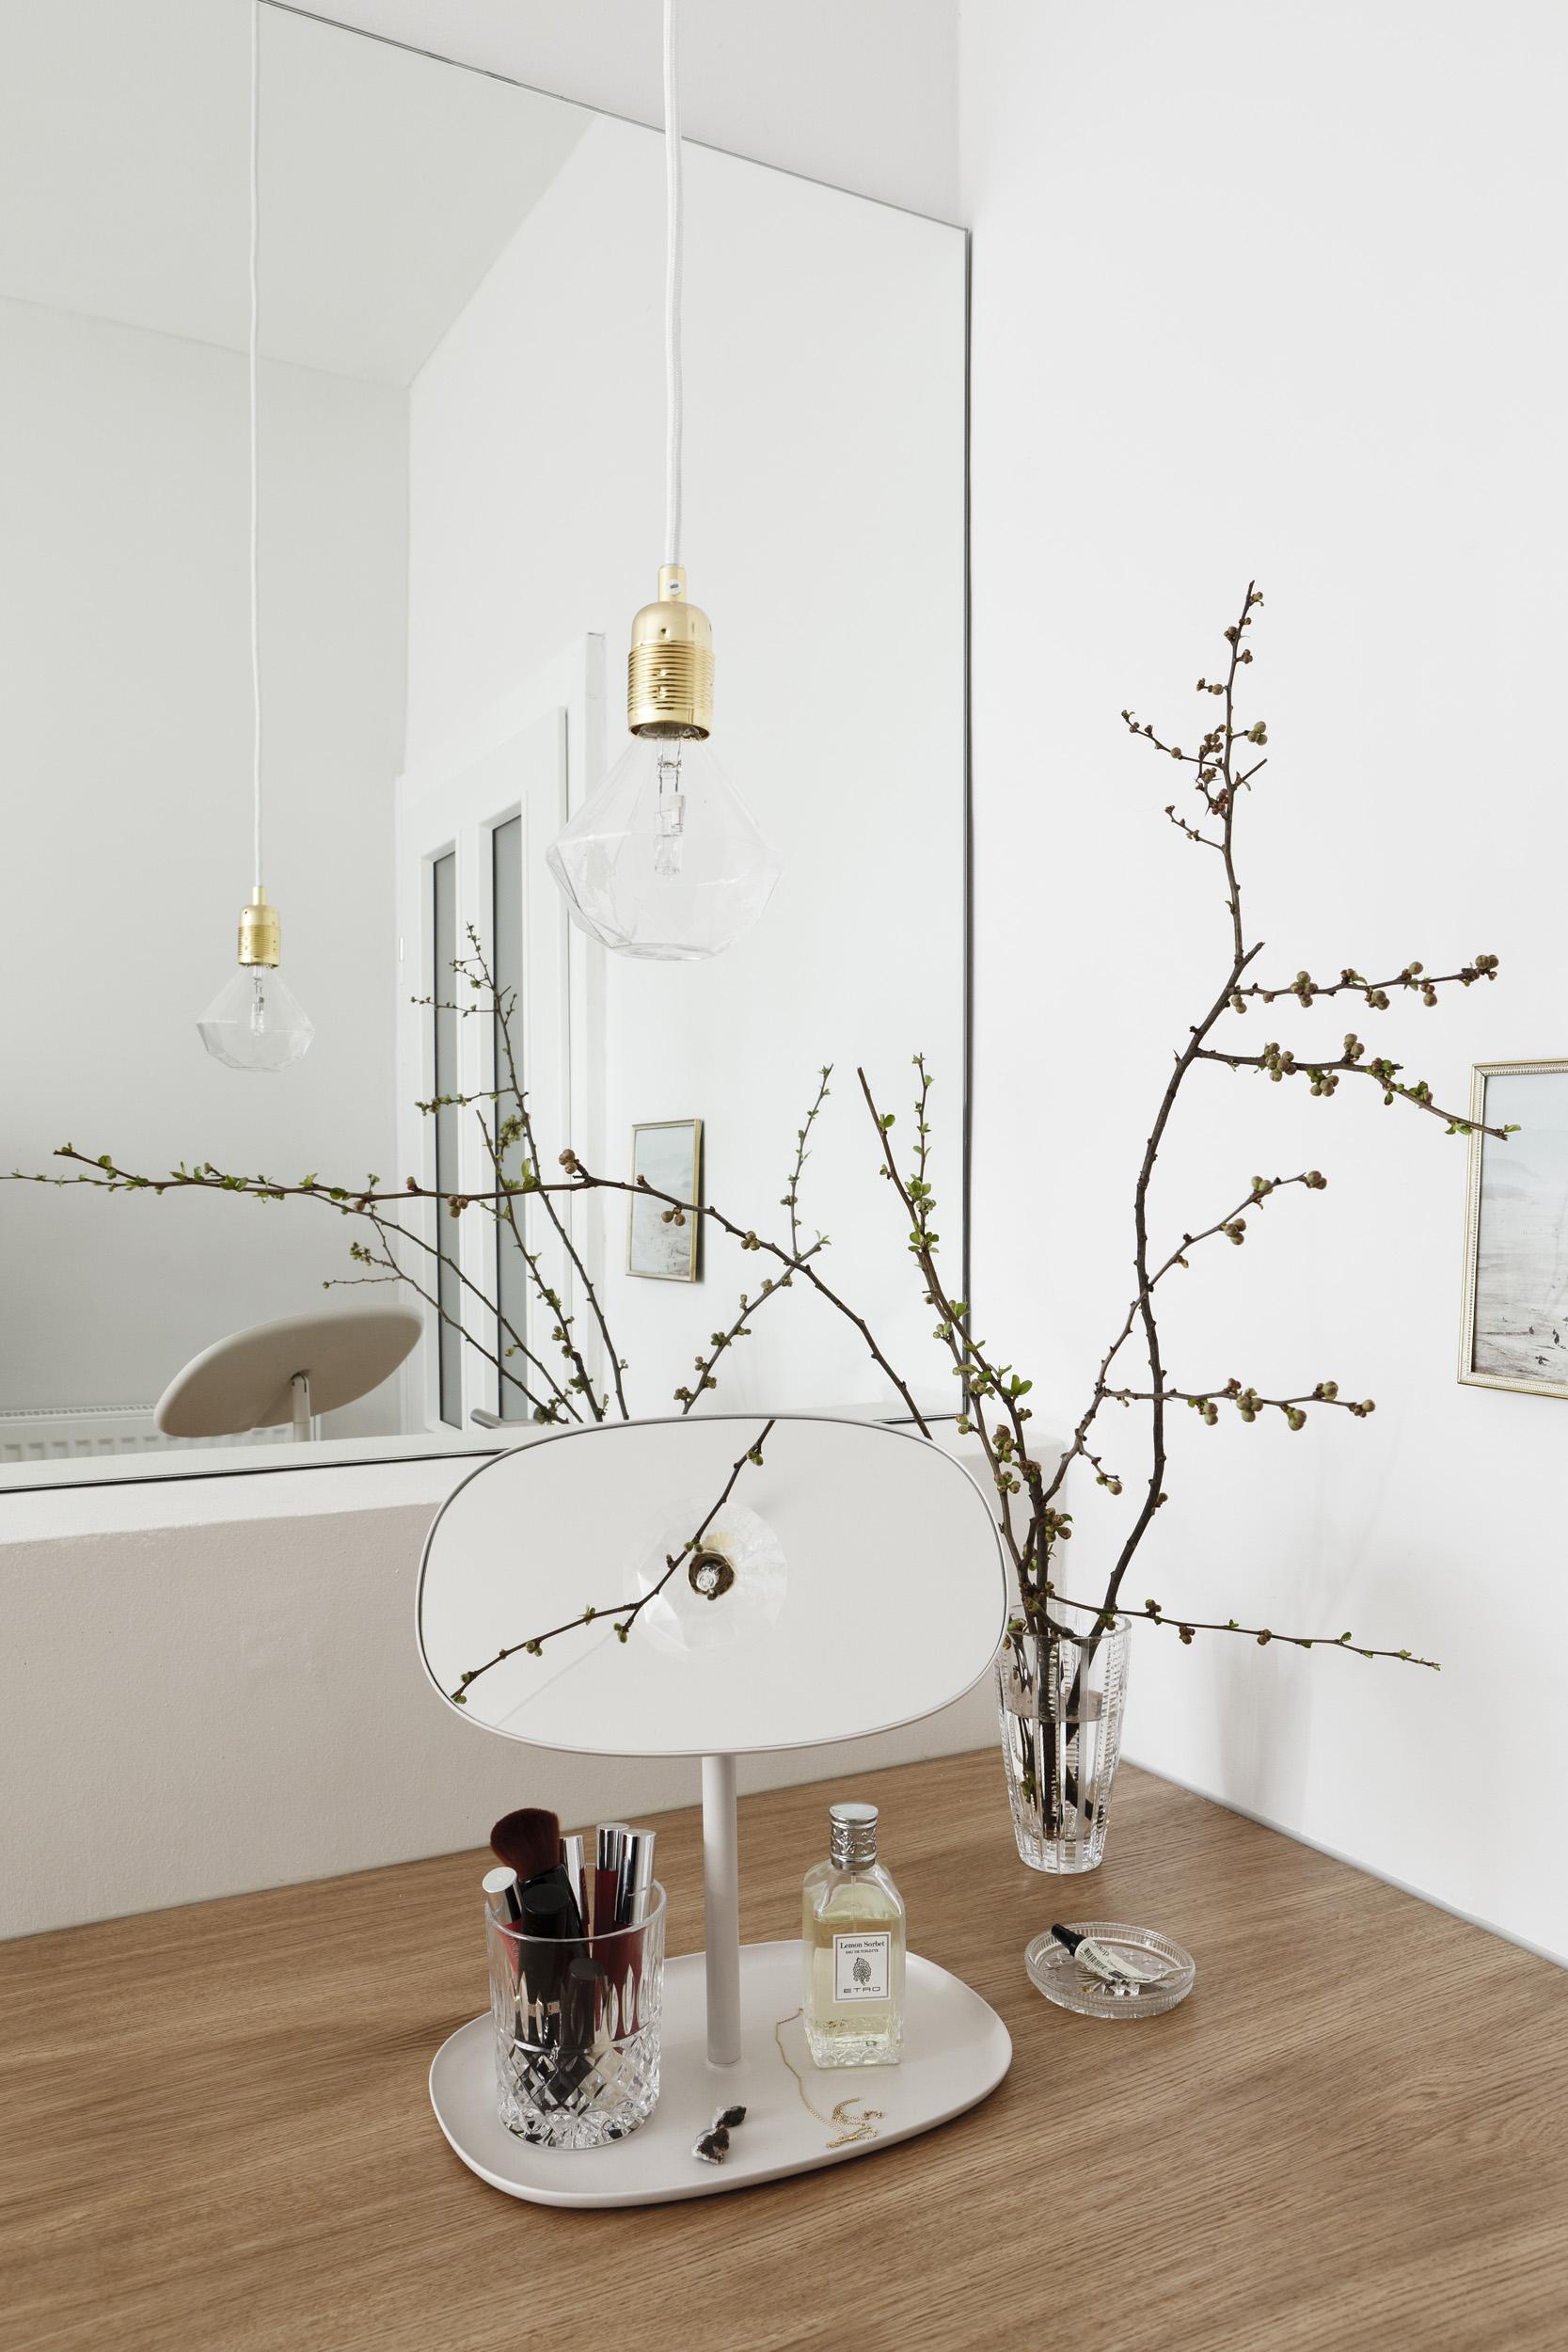 Studio-Oink-House-Cal-II-apartment-remodel-Mainz-Germany-Remodelista-1S.jpg